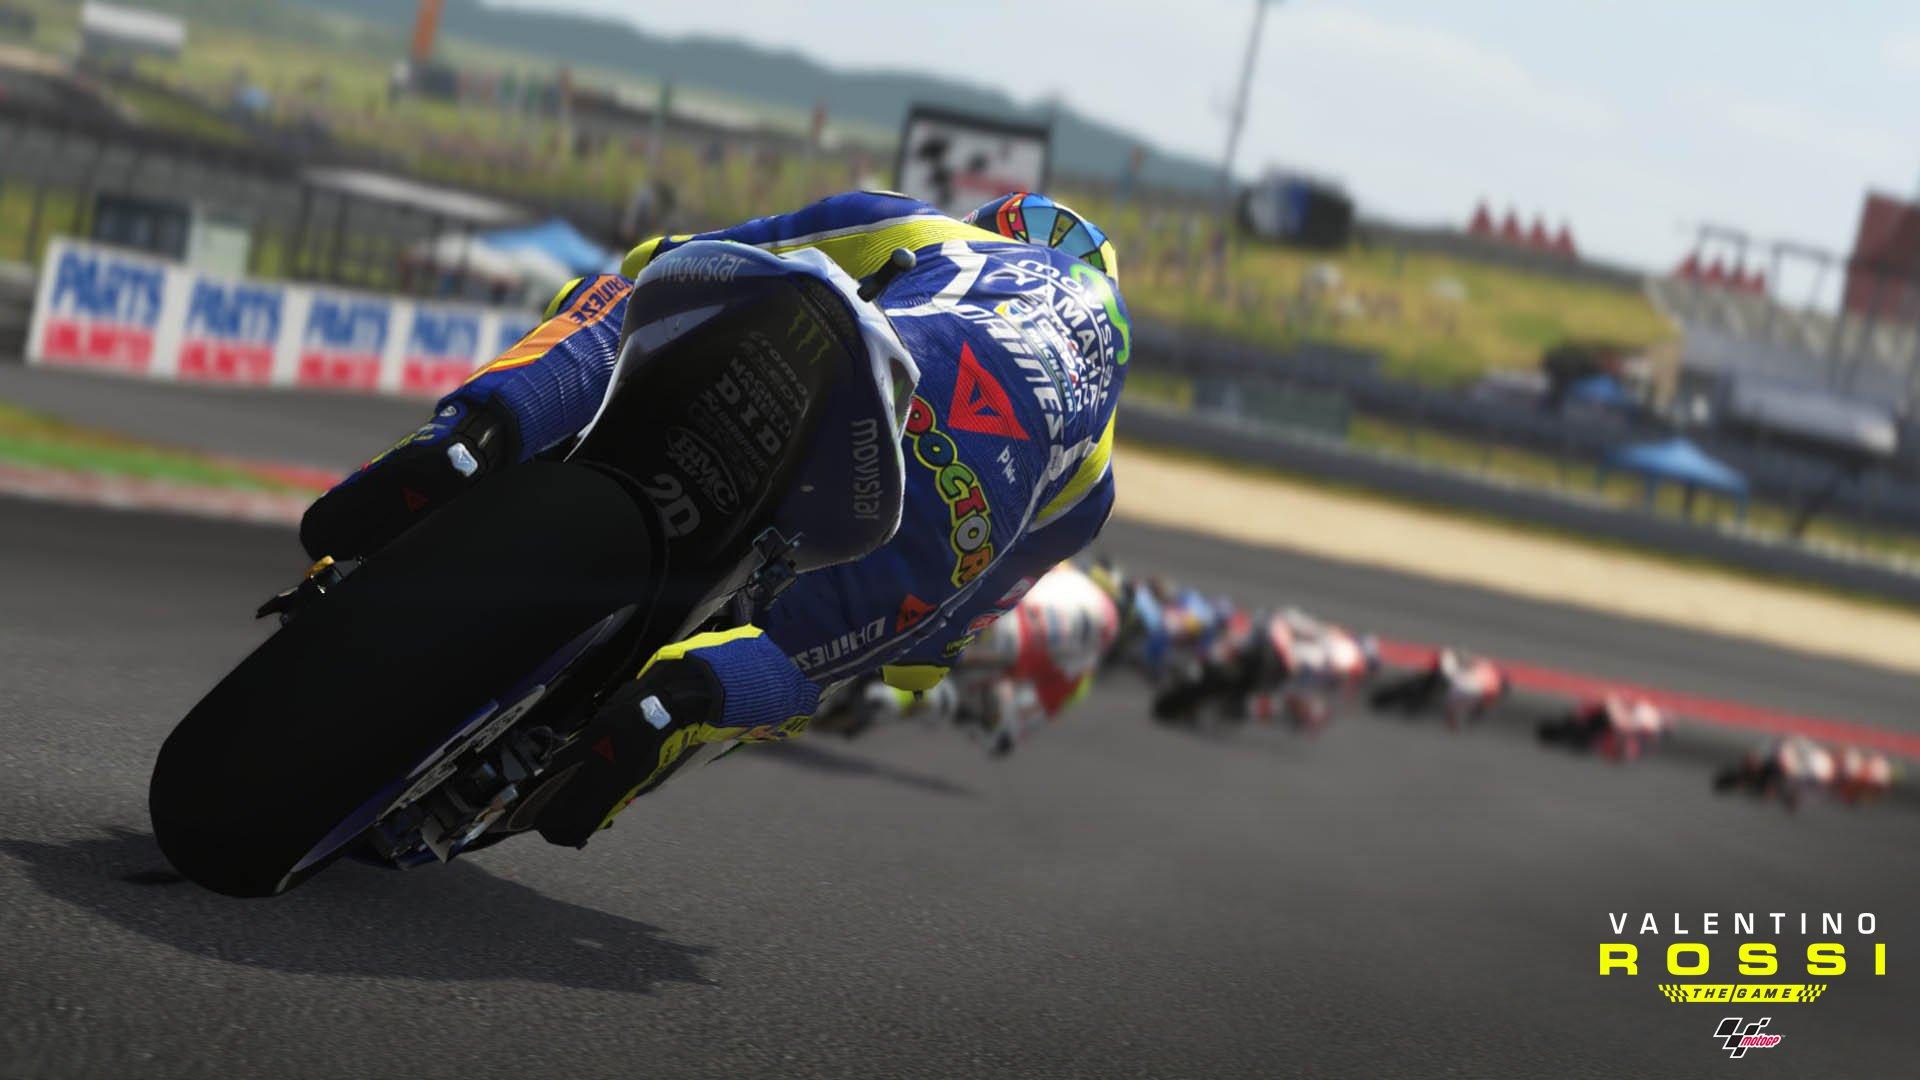 Valentino Rossi The Game 3